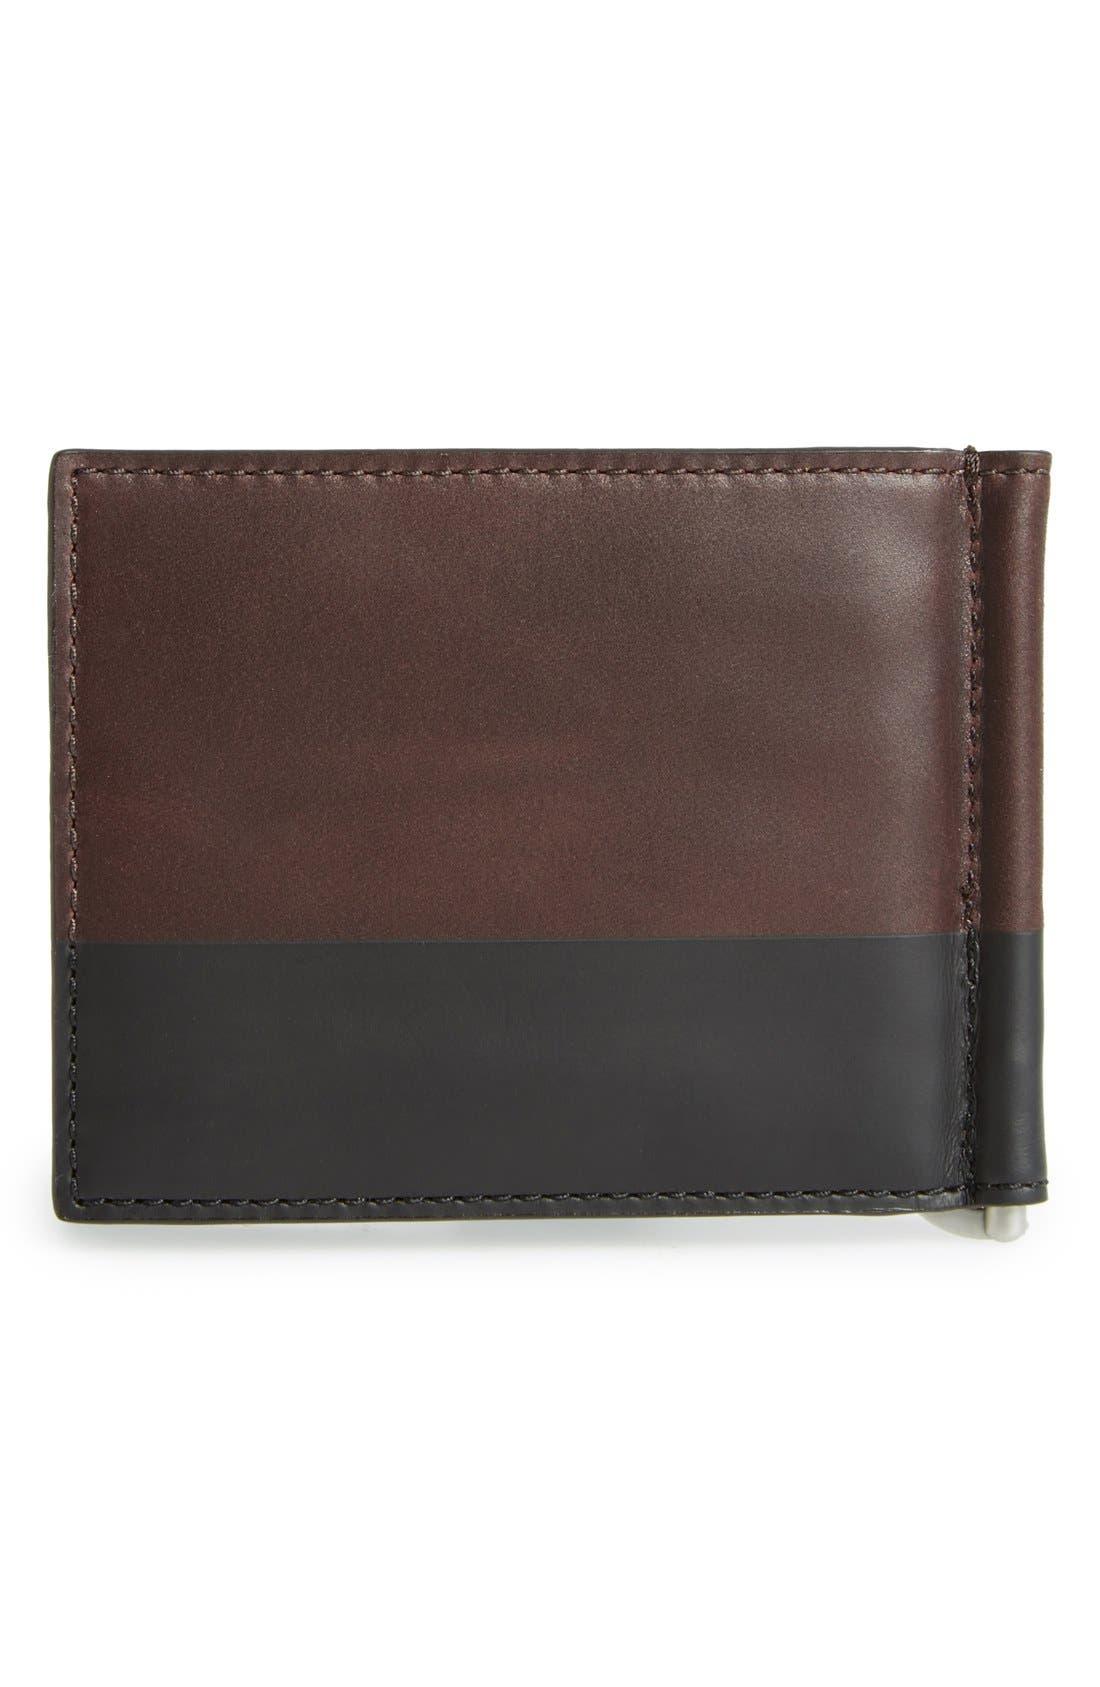 JACK SPADE,                             Leather Money Clip Wallet,                             Alternate thumbnail 3, color,                             203